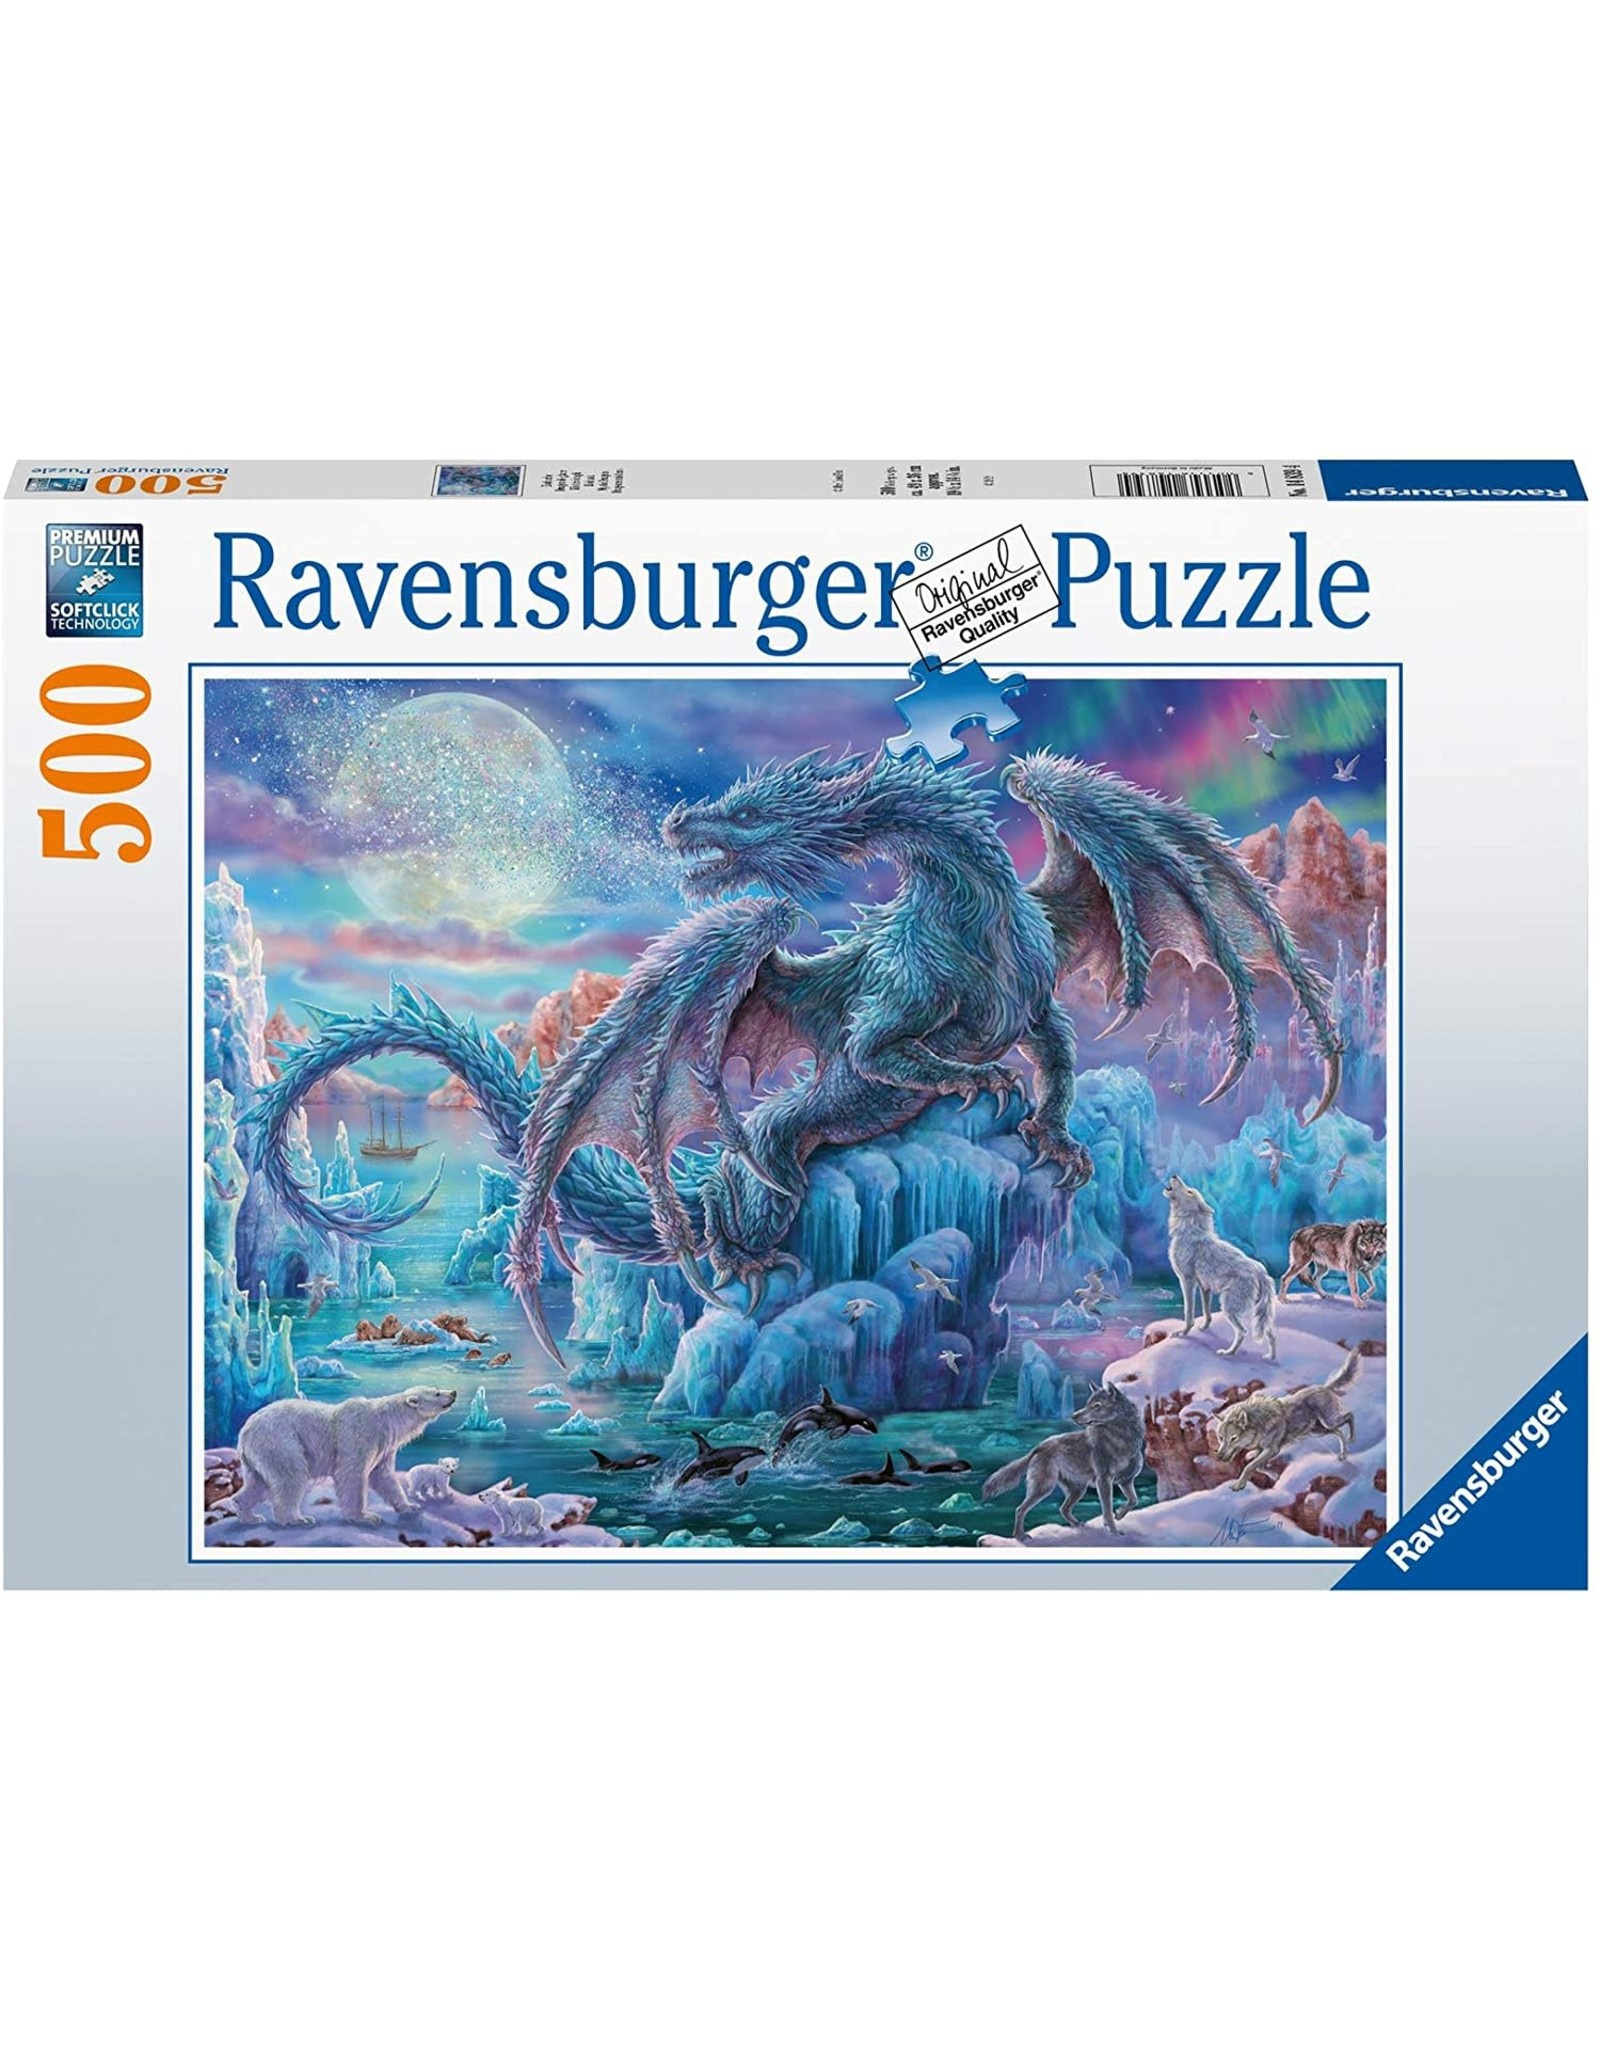 Ravensburger Mystical Dragons 500